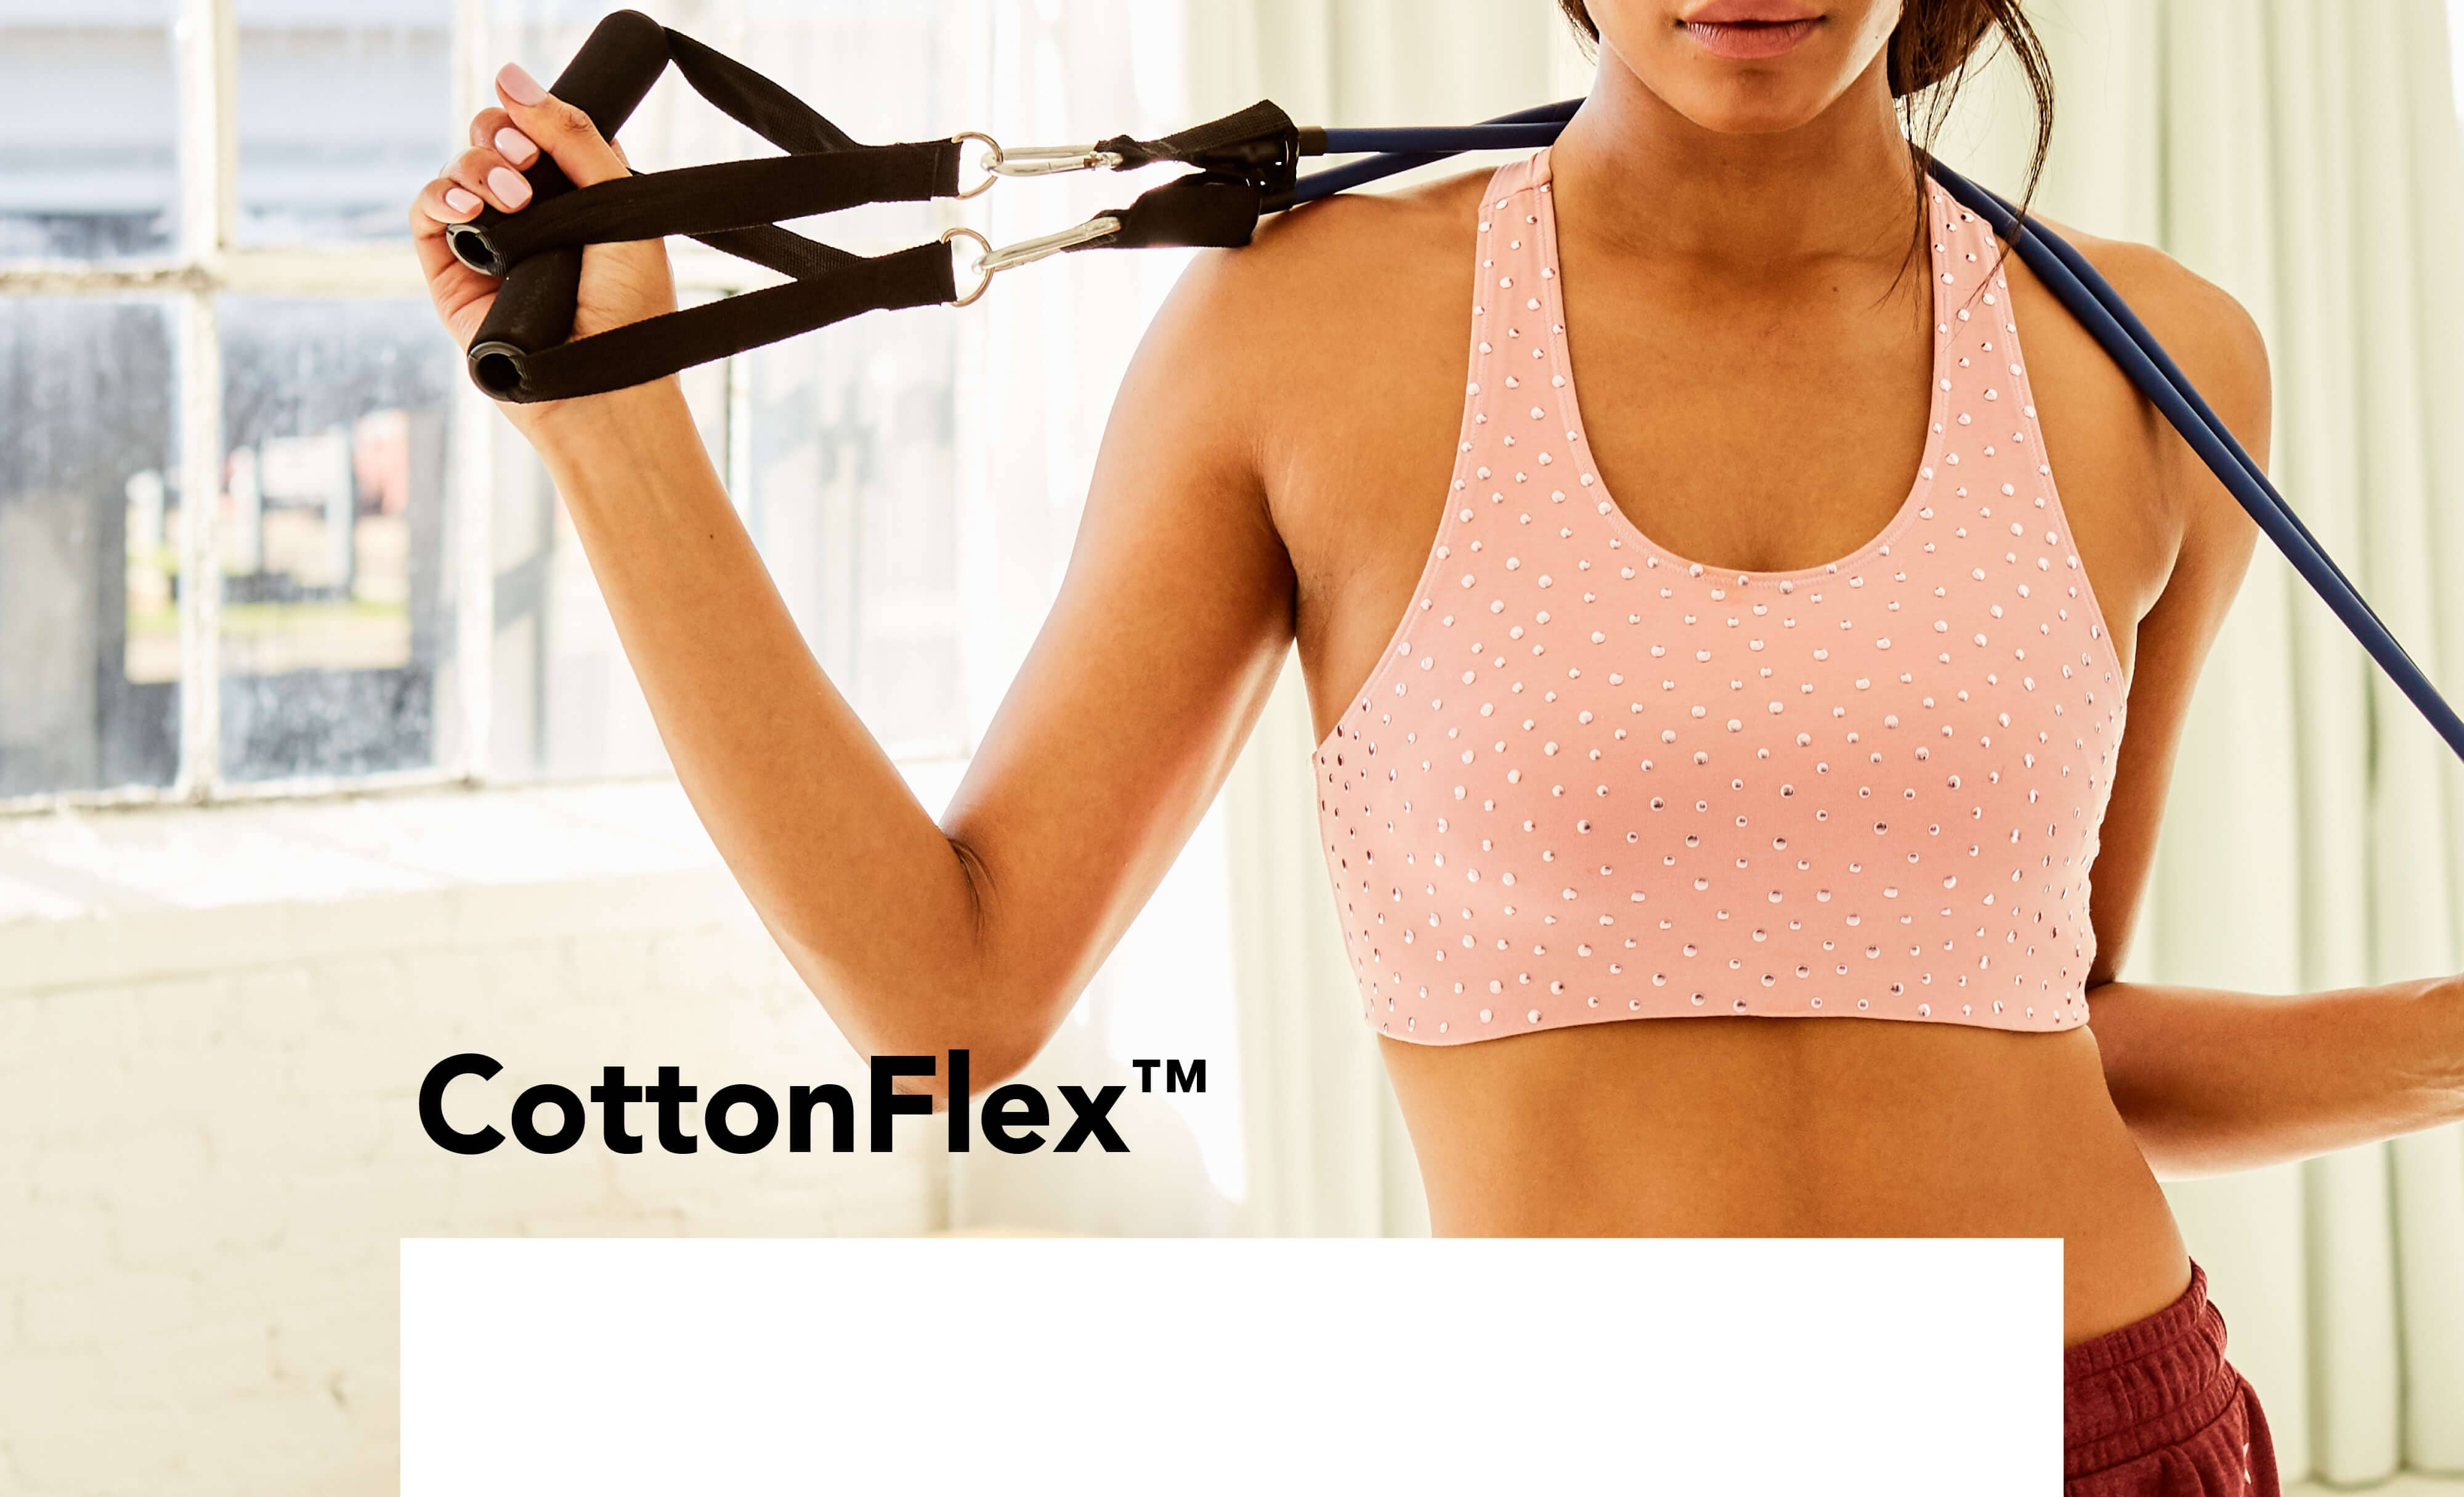 CottonFlex